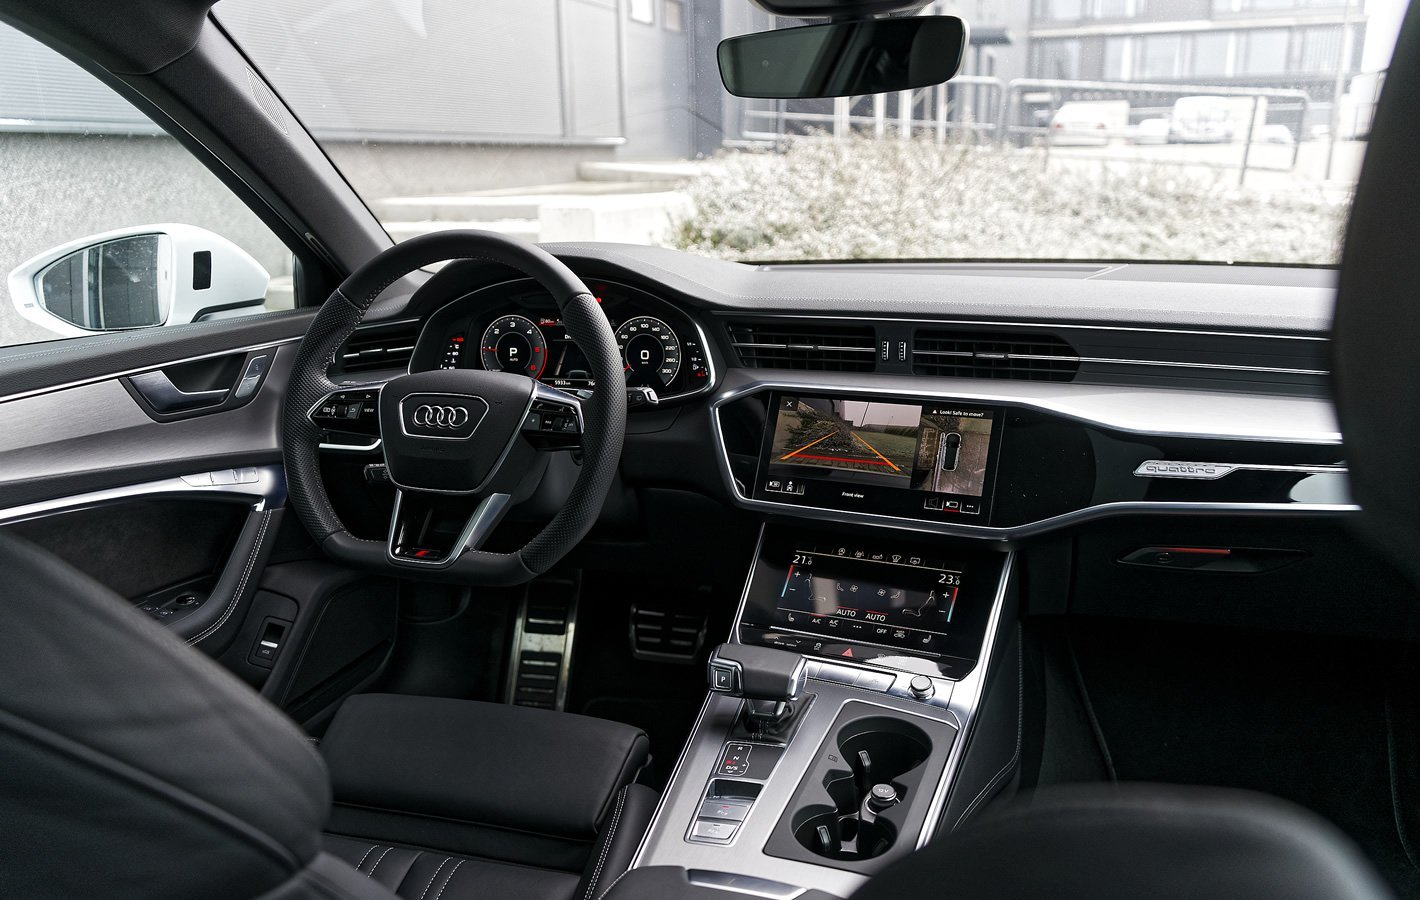 Audi A6 Avant w środku